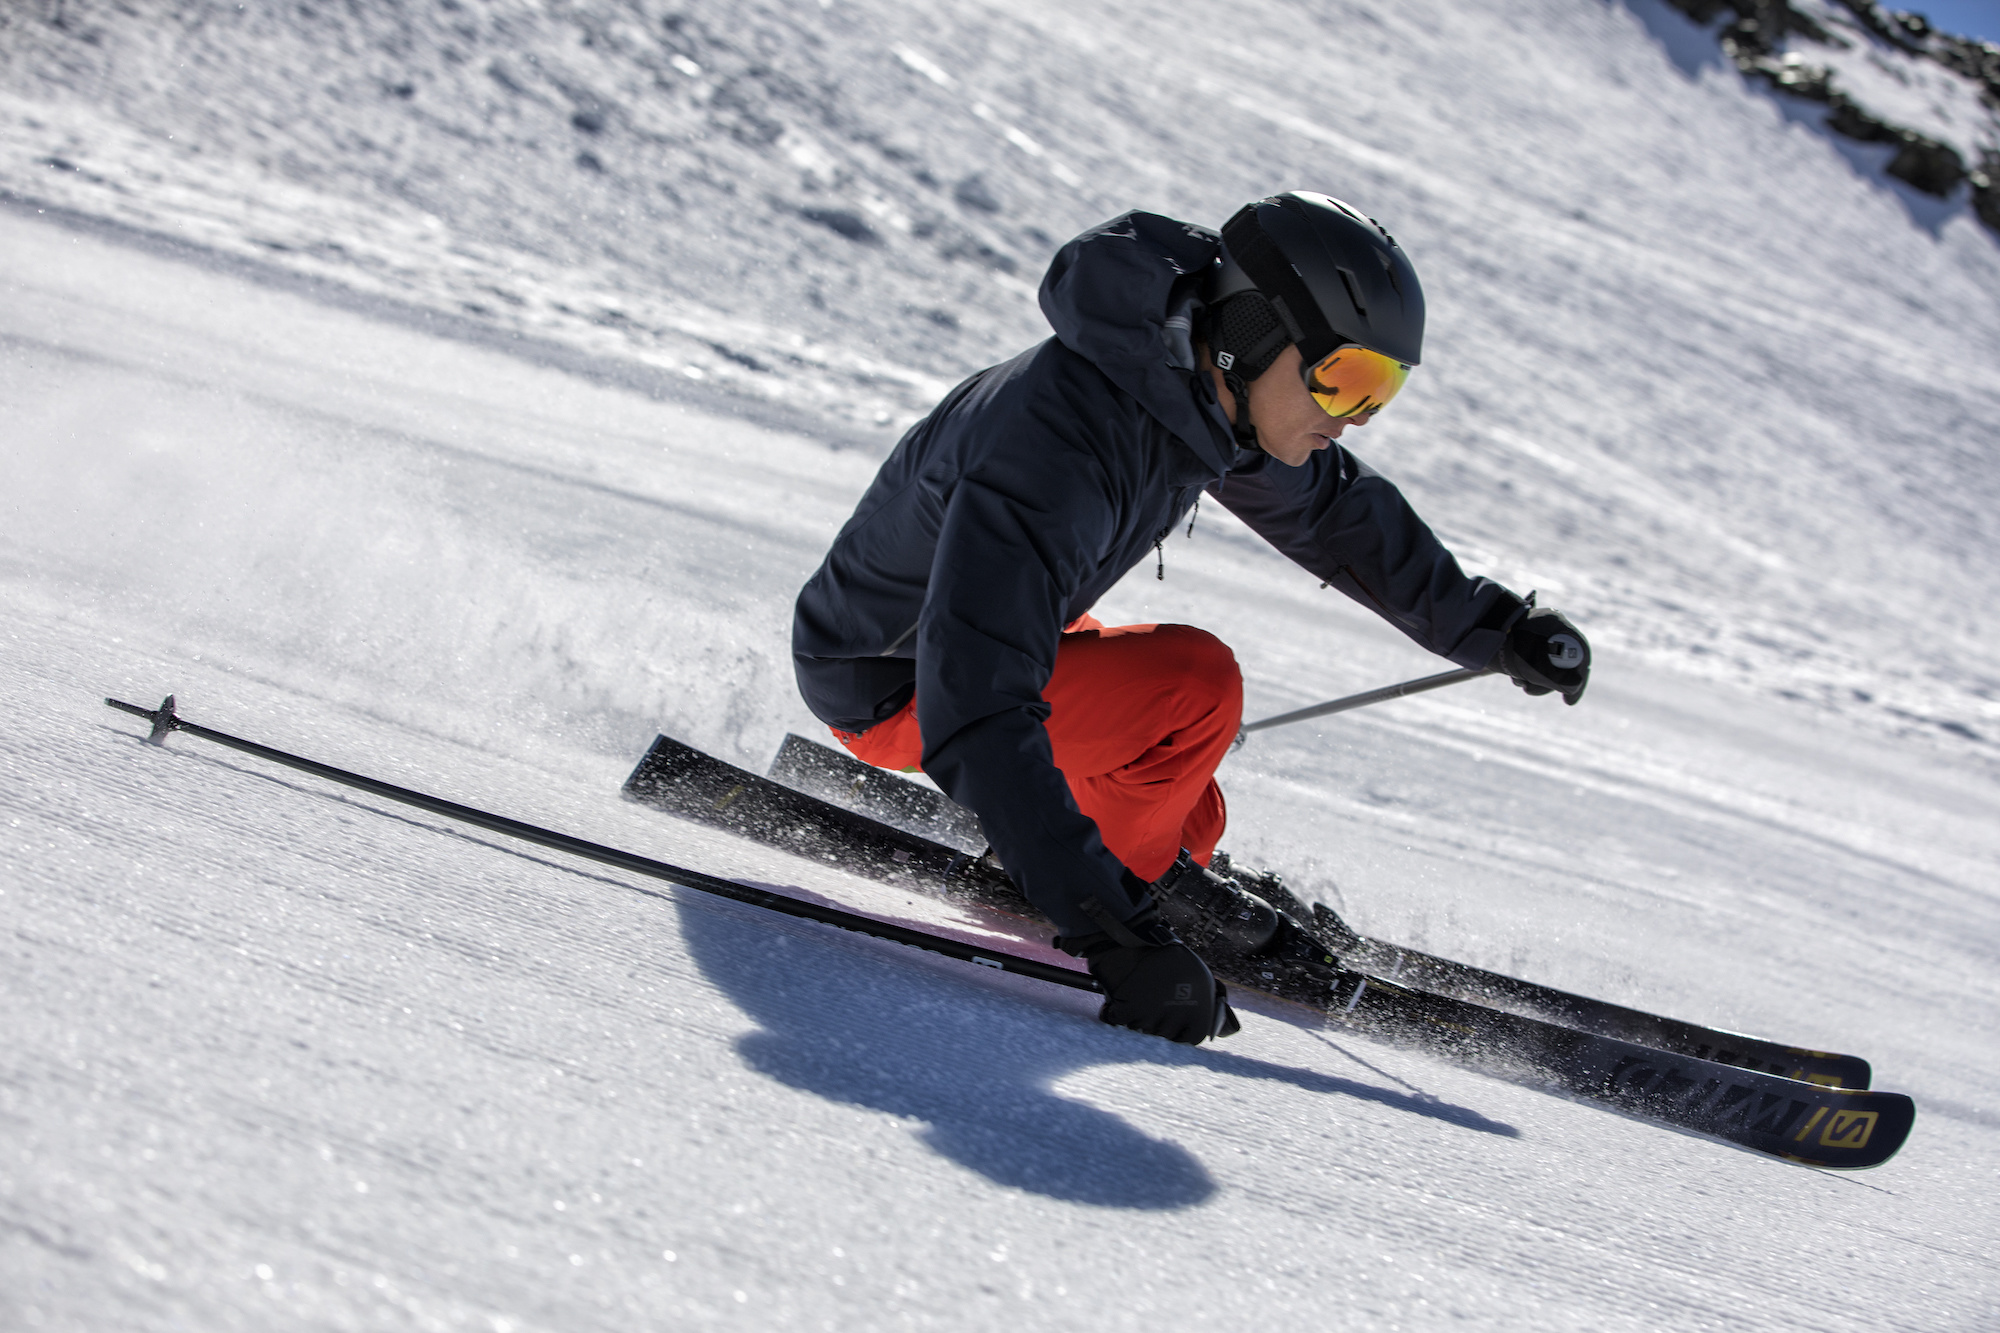 Ski Equipment | Adventure 365 | Skiing, Snowboarding Winter Sporting Goods